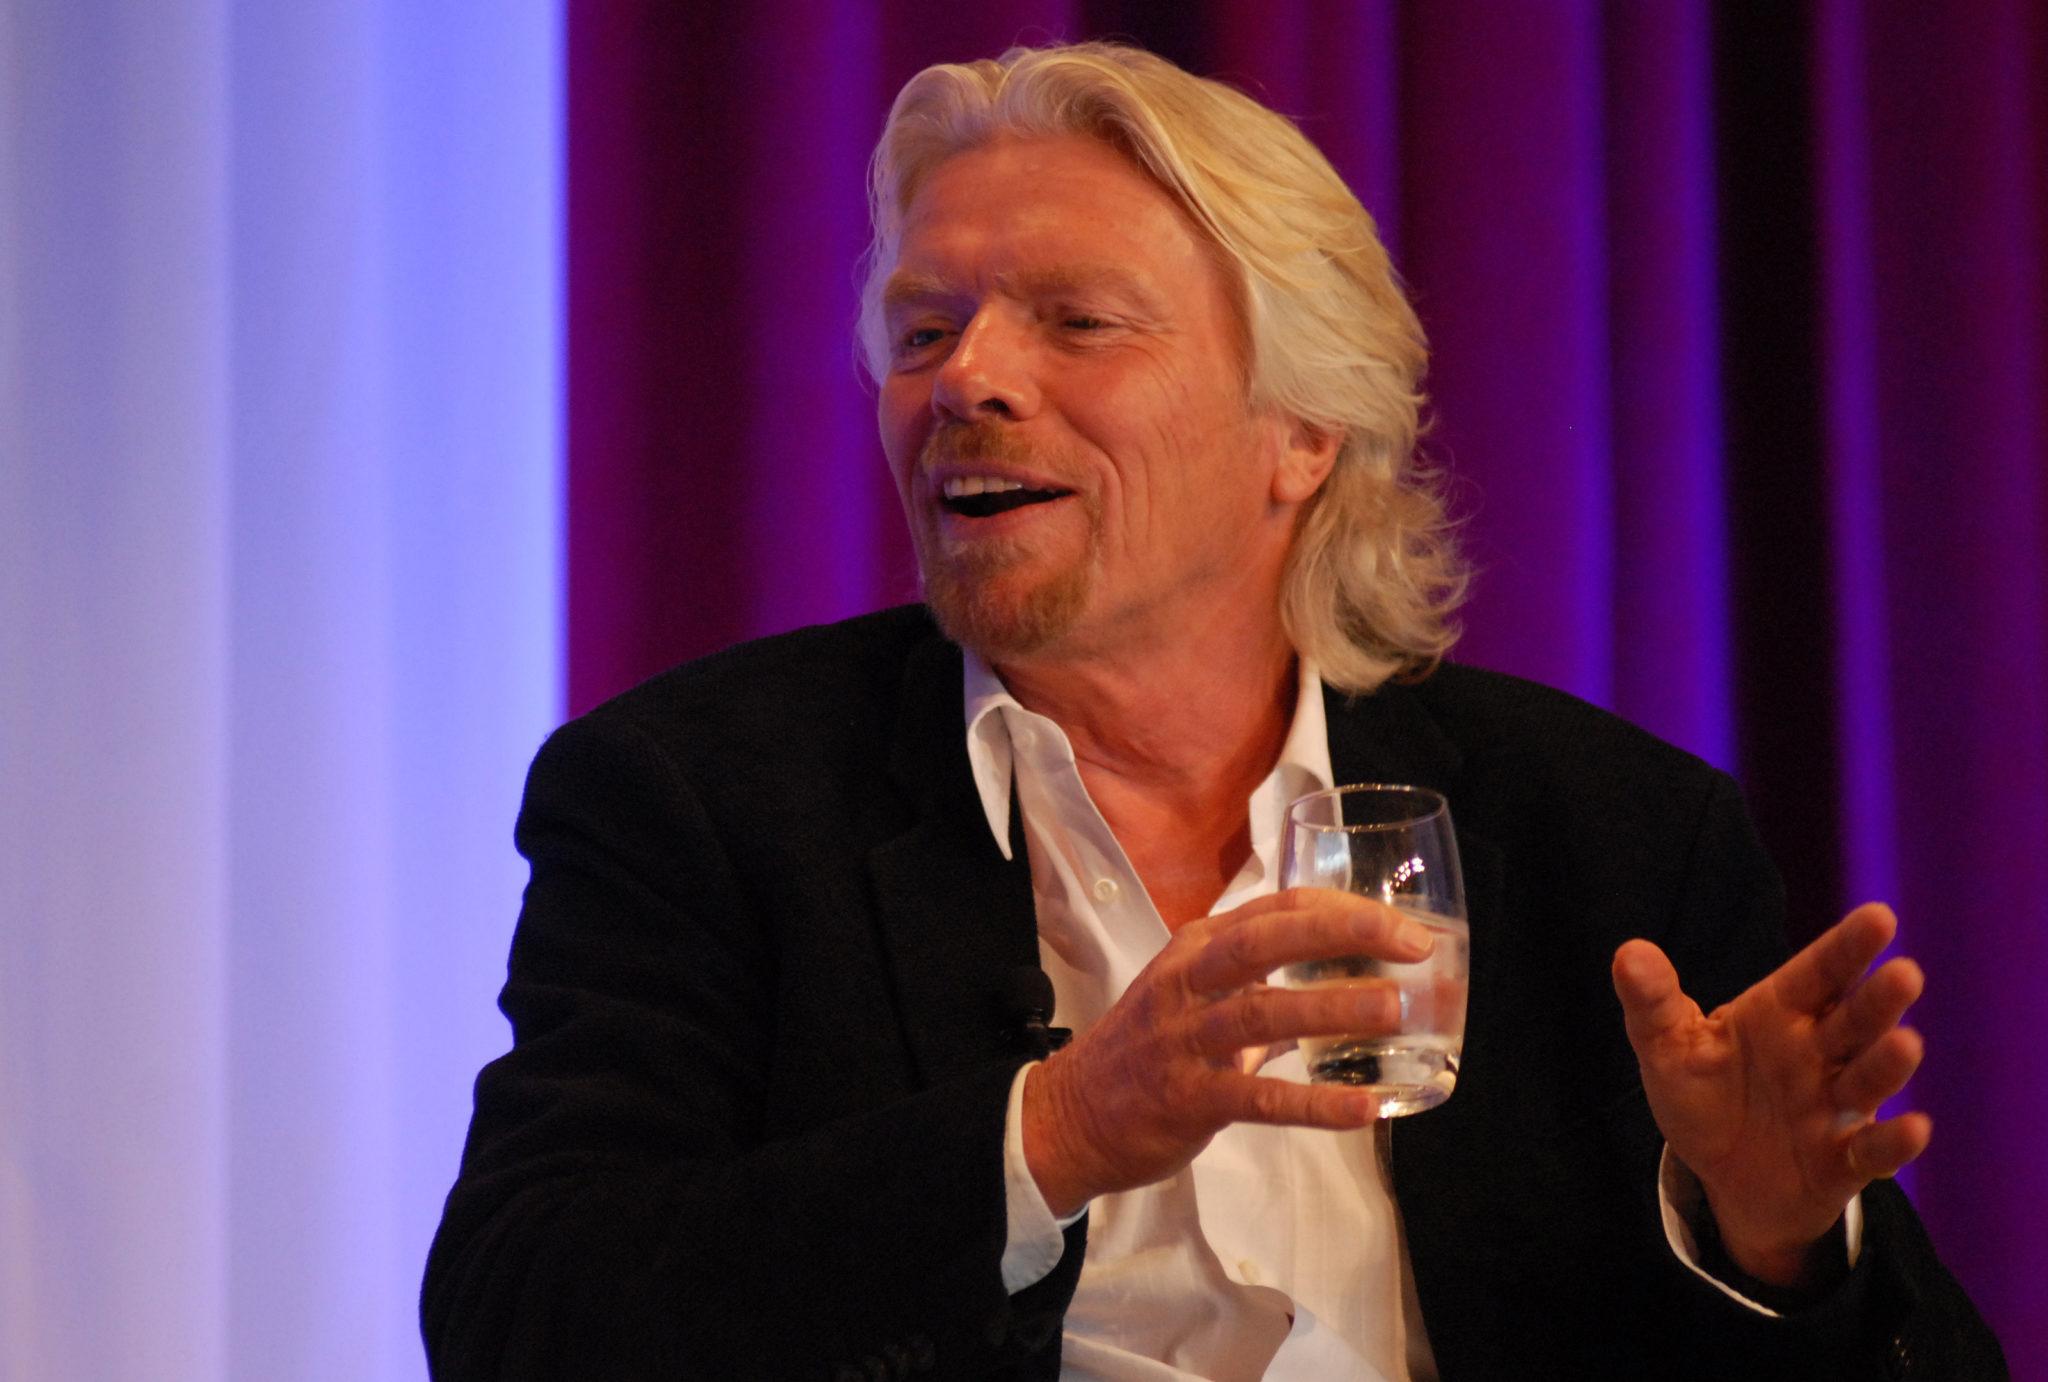 How Richard Branson Channeled This Negative Emotion Into a Billion-Dollar Empire